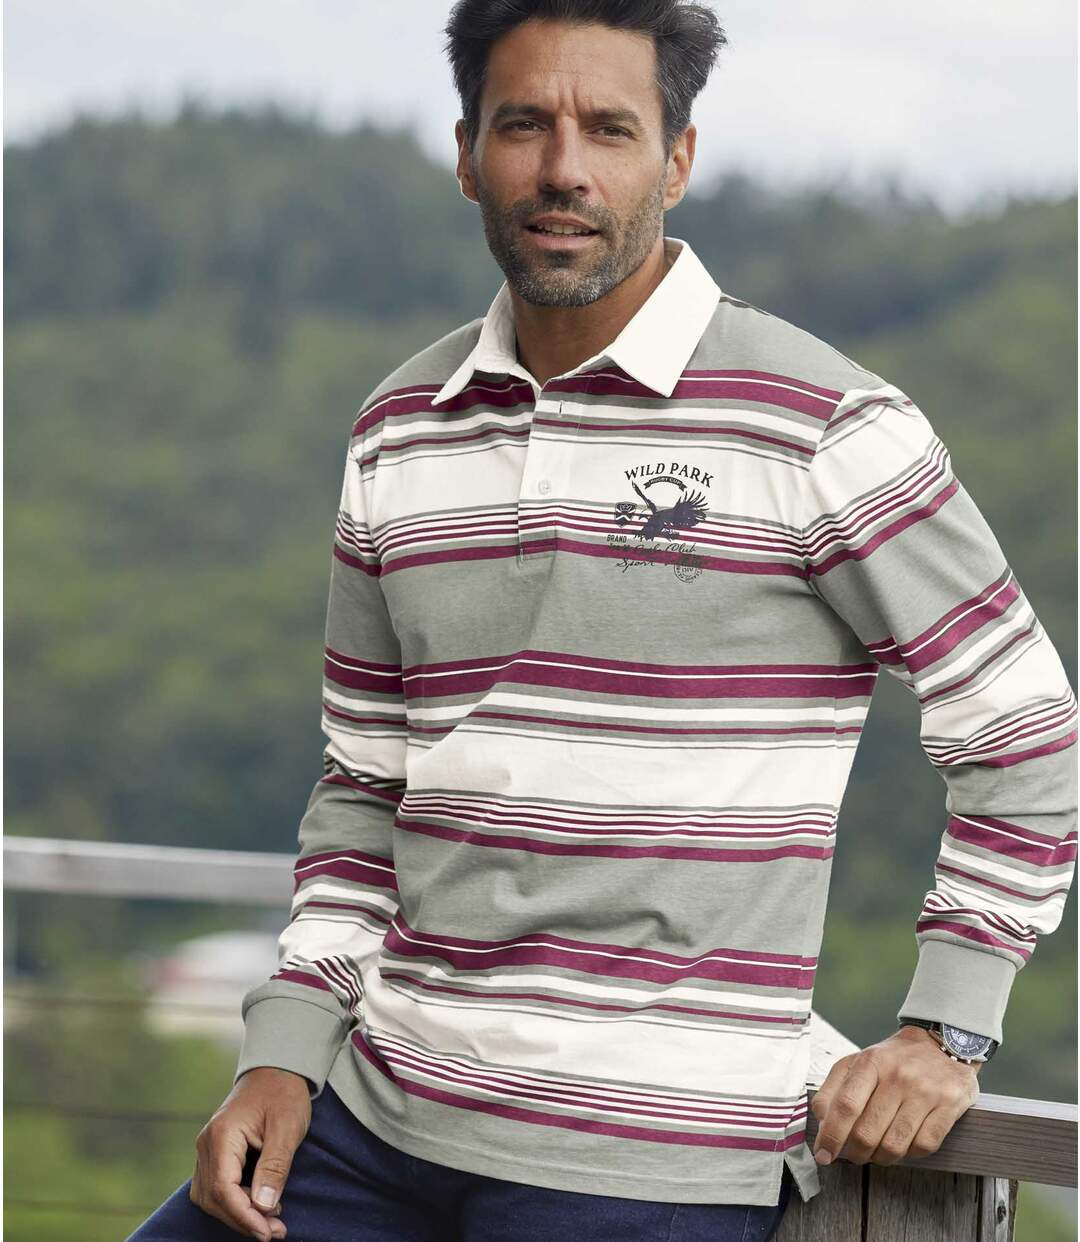 Poloshirt Sport Club im Rugby-Stil